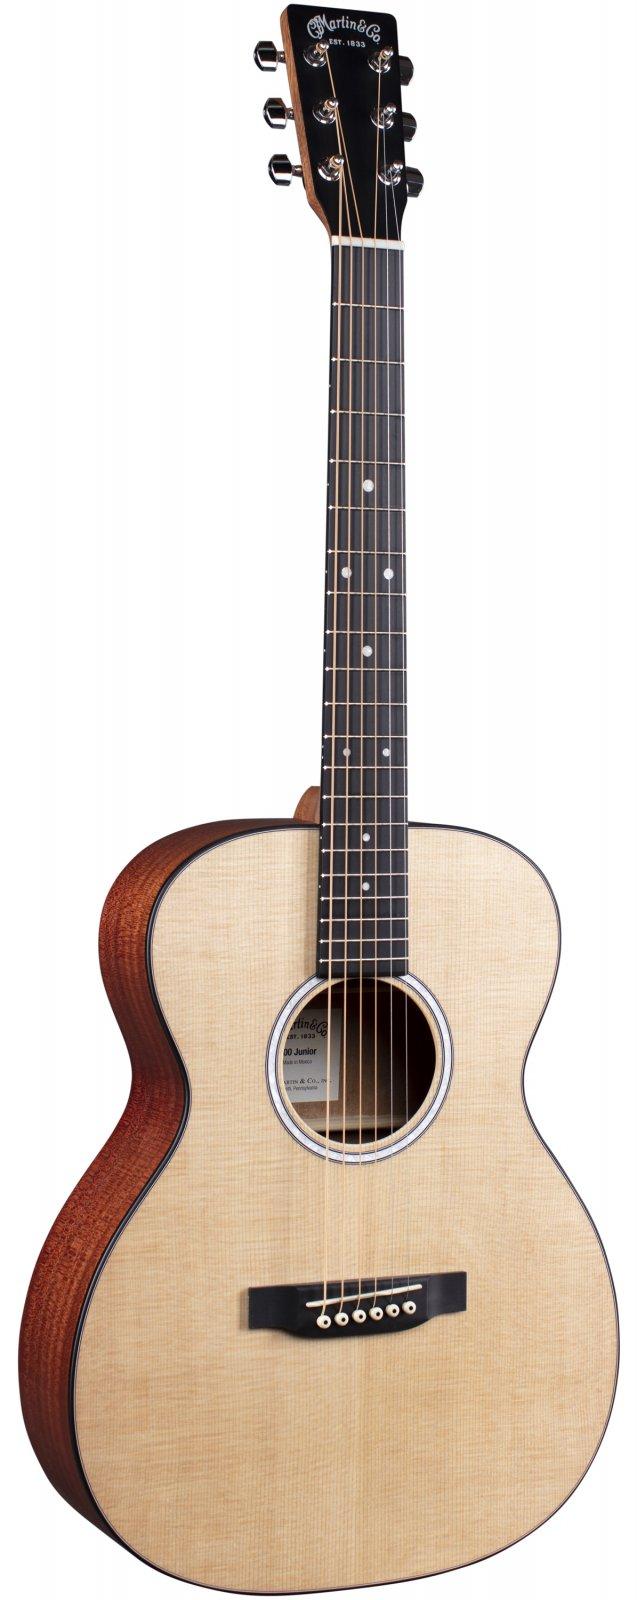 Martin 000 Jr-10 Junior Auditoriam Acoustic Guitar with Gigbag